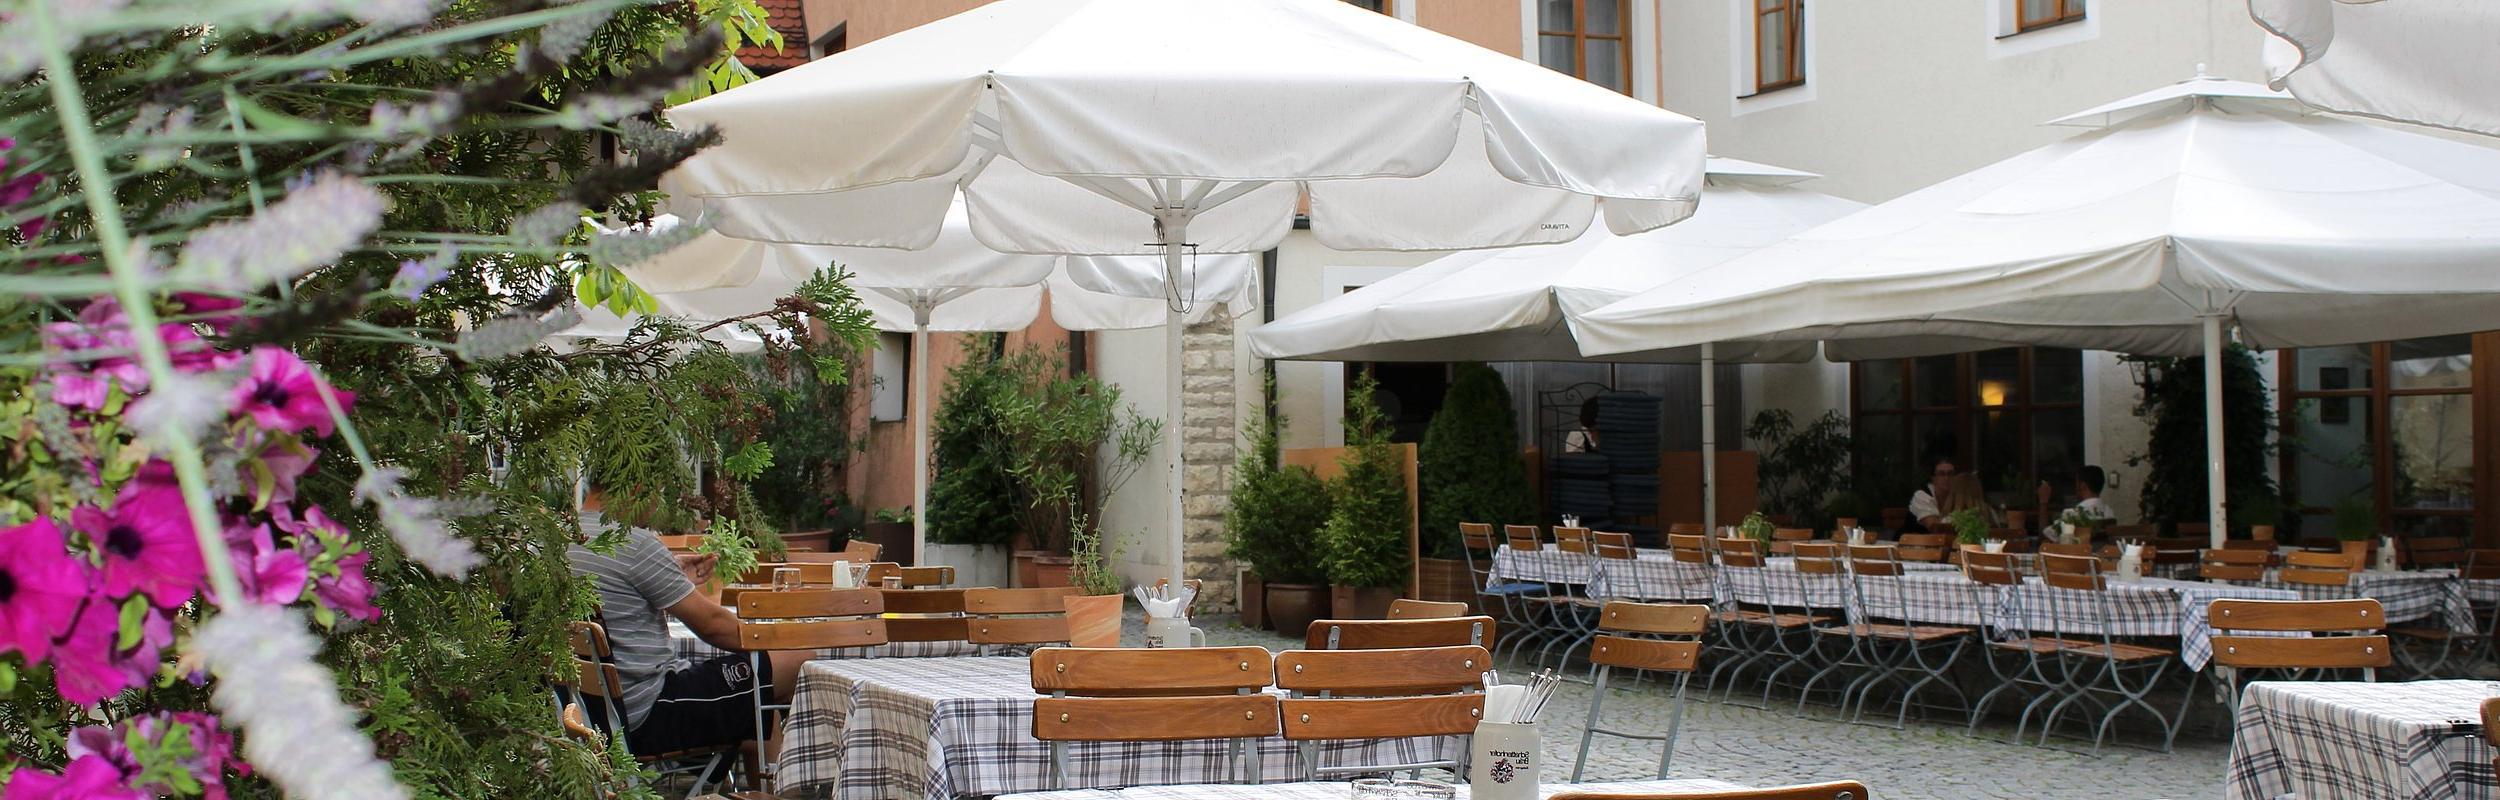 Braugasthof Hotel Schattenhofer – Naturpark Altmühltal In Trendy Keltner Patio Outdoor Market Umbrellas (View 4 of 20)